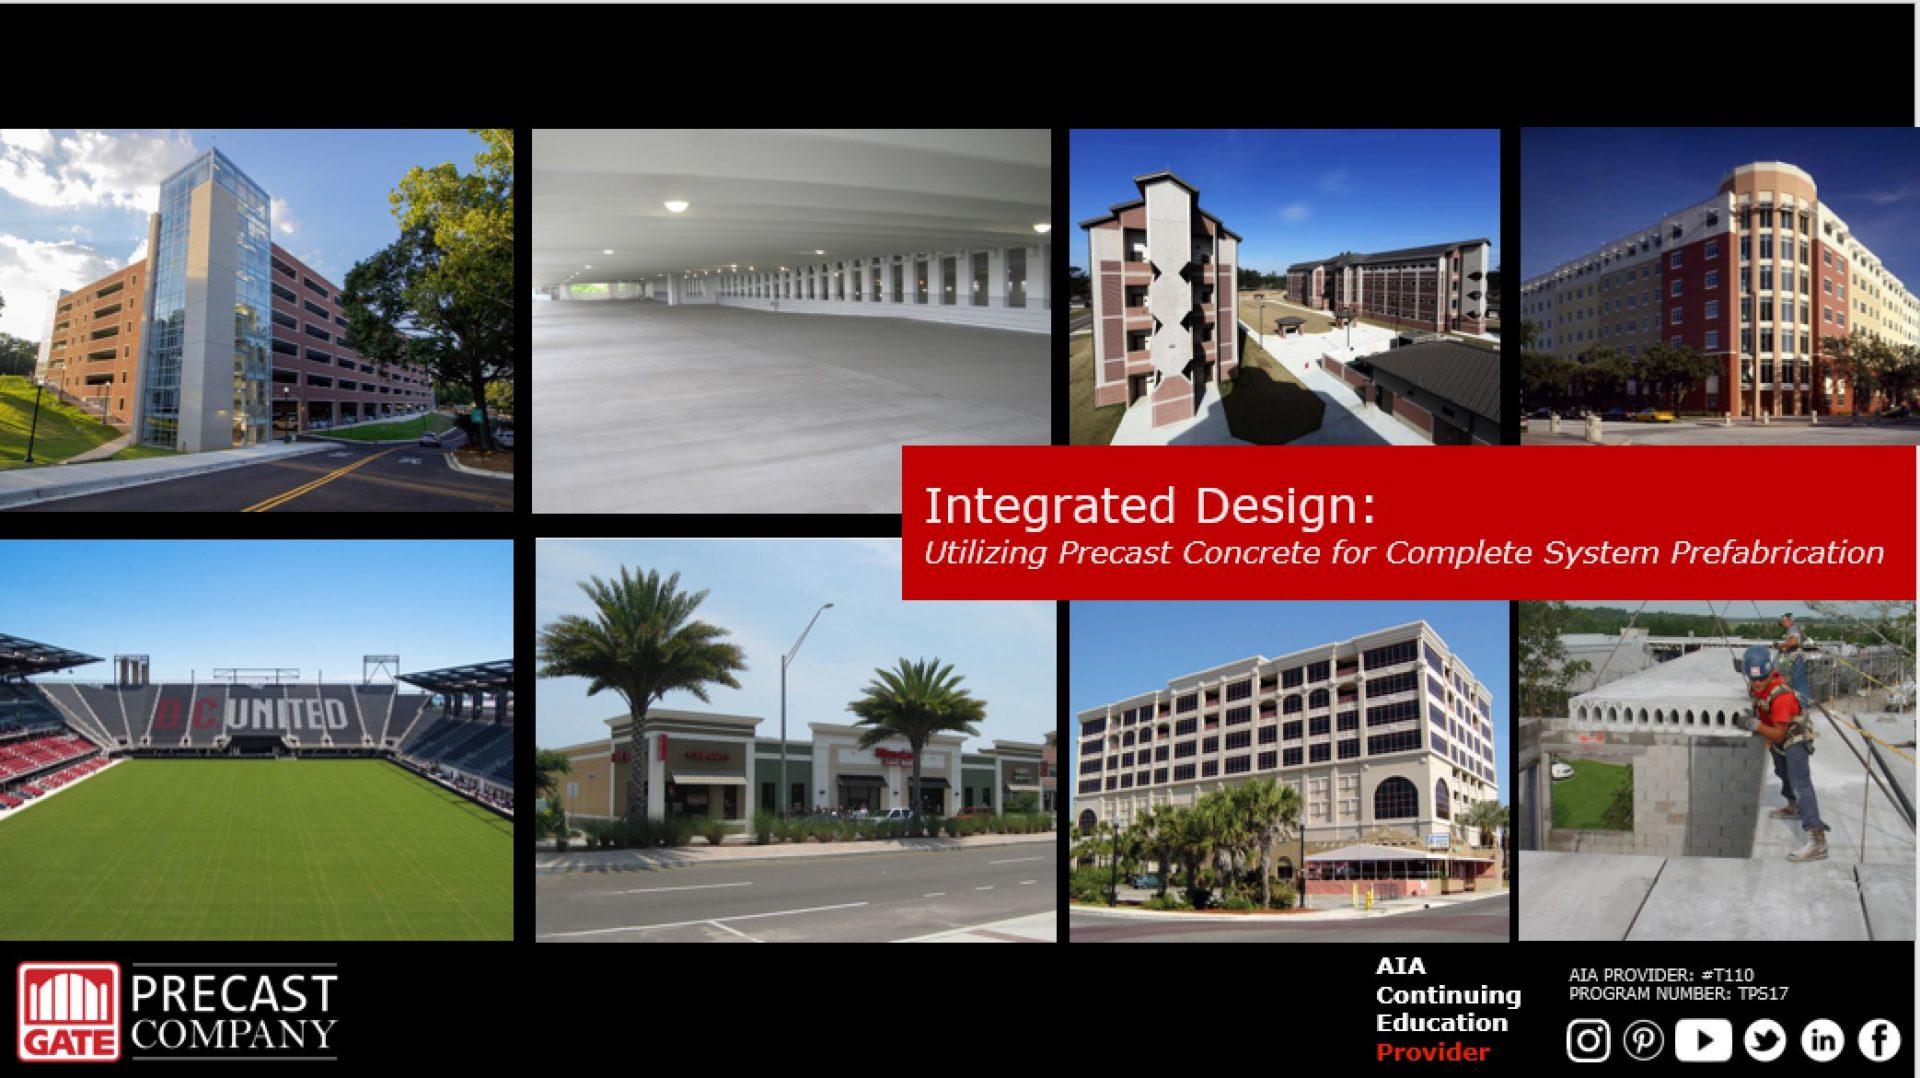 Integrated Design: Utilizing Precast Concrete for Complete System Prefabrication